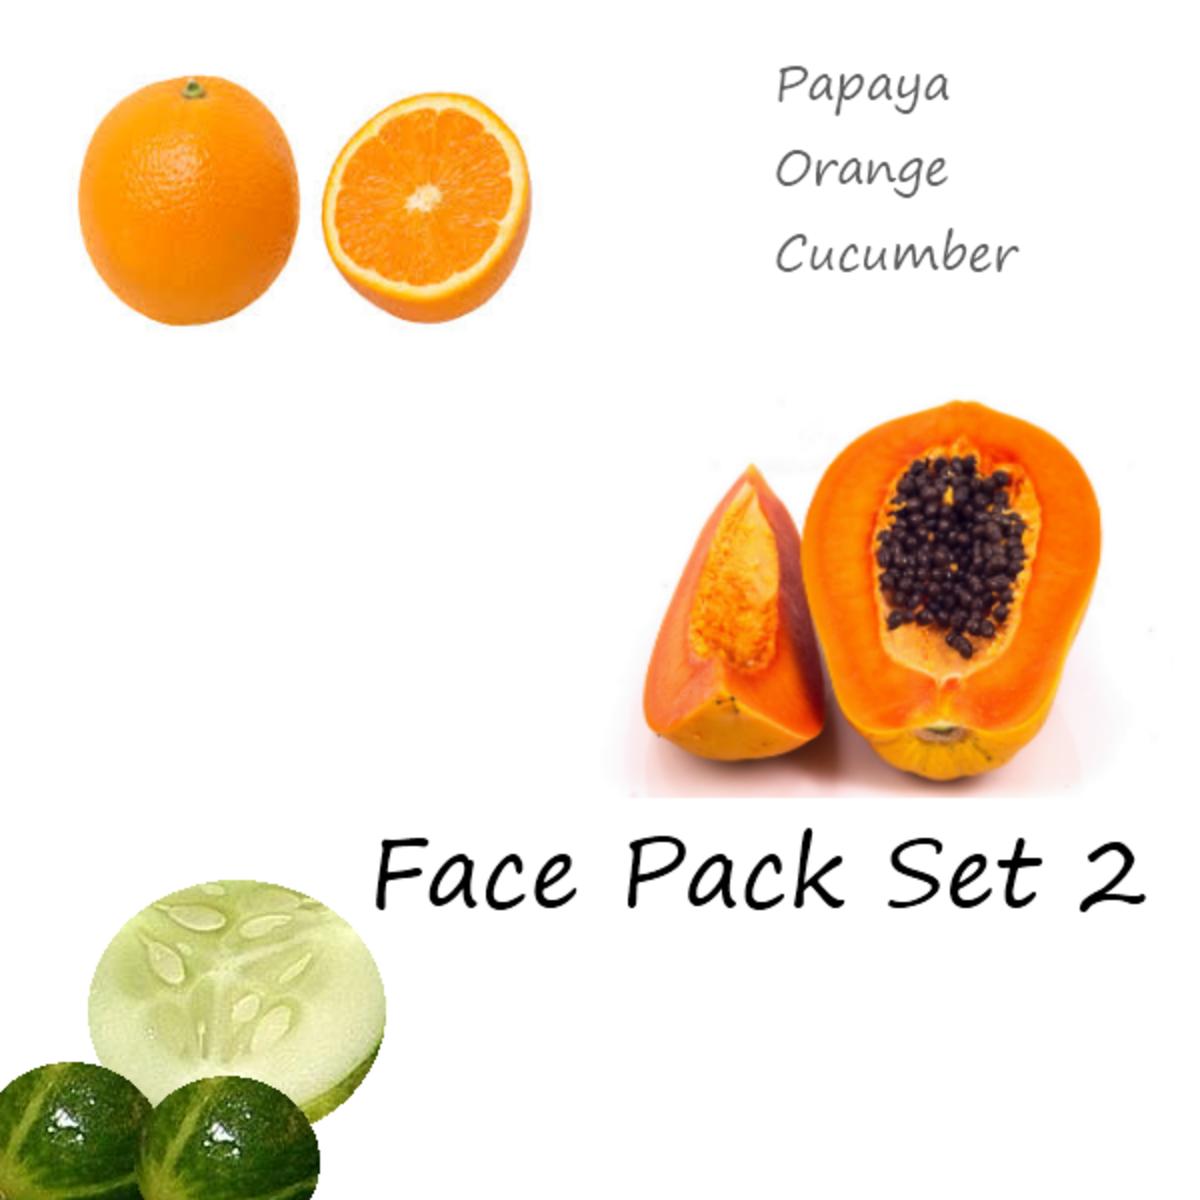 5-natural-face-packs-to-remove-sun-tan